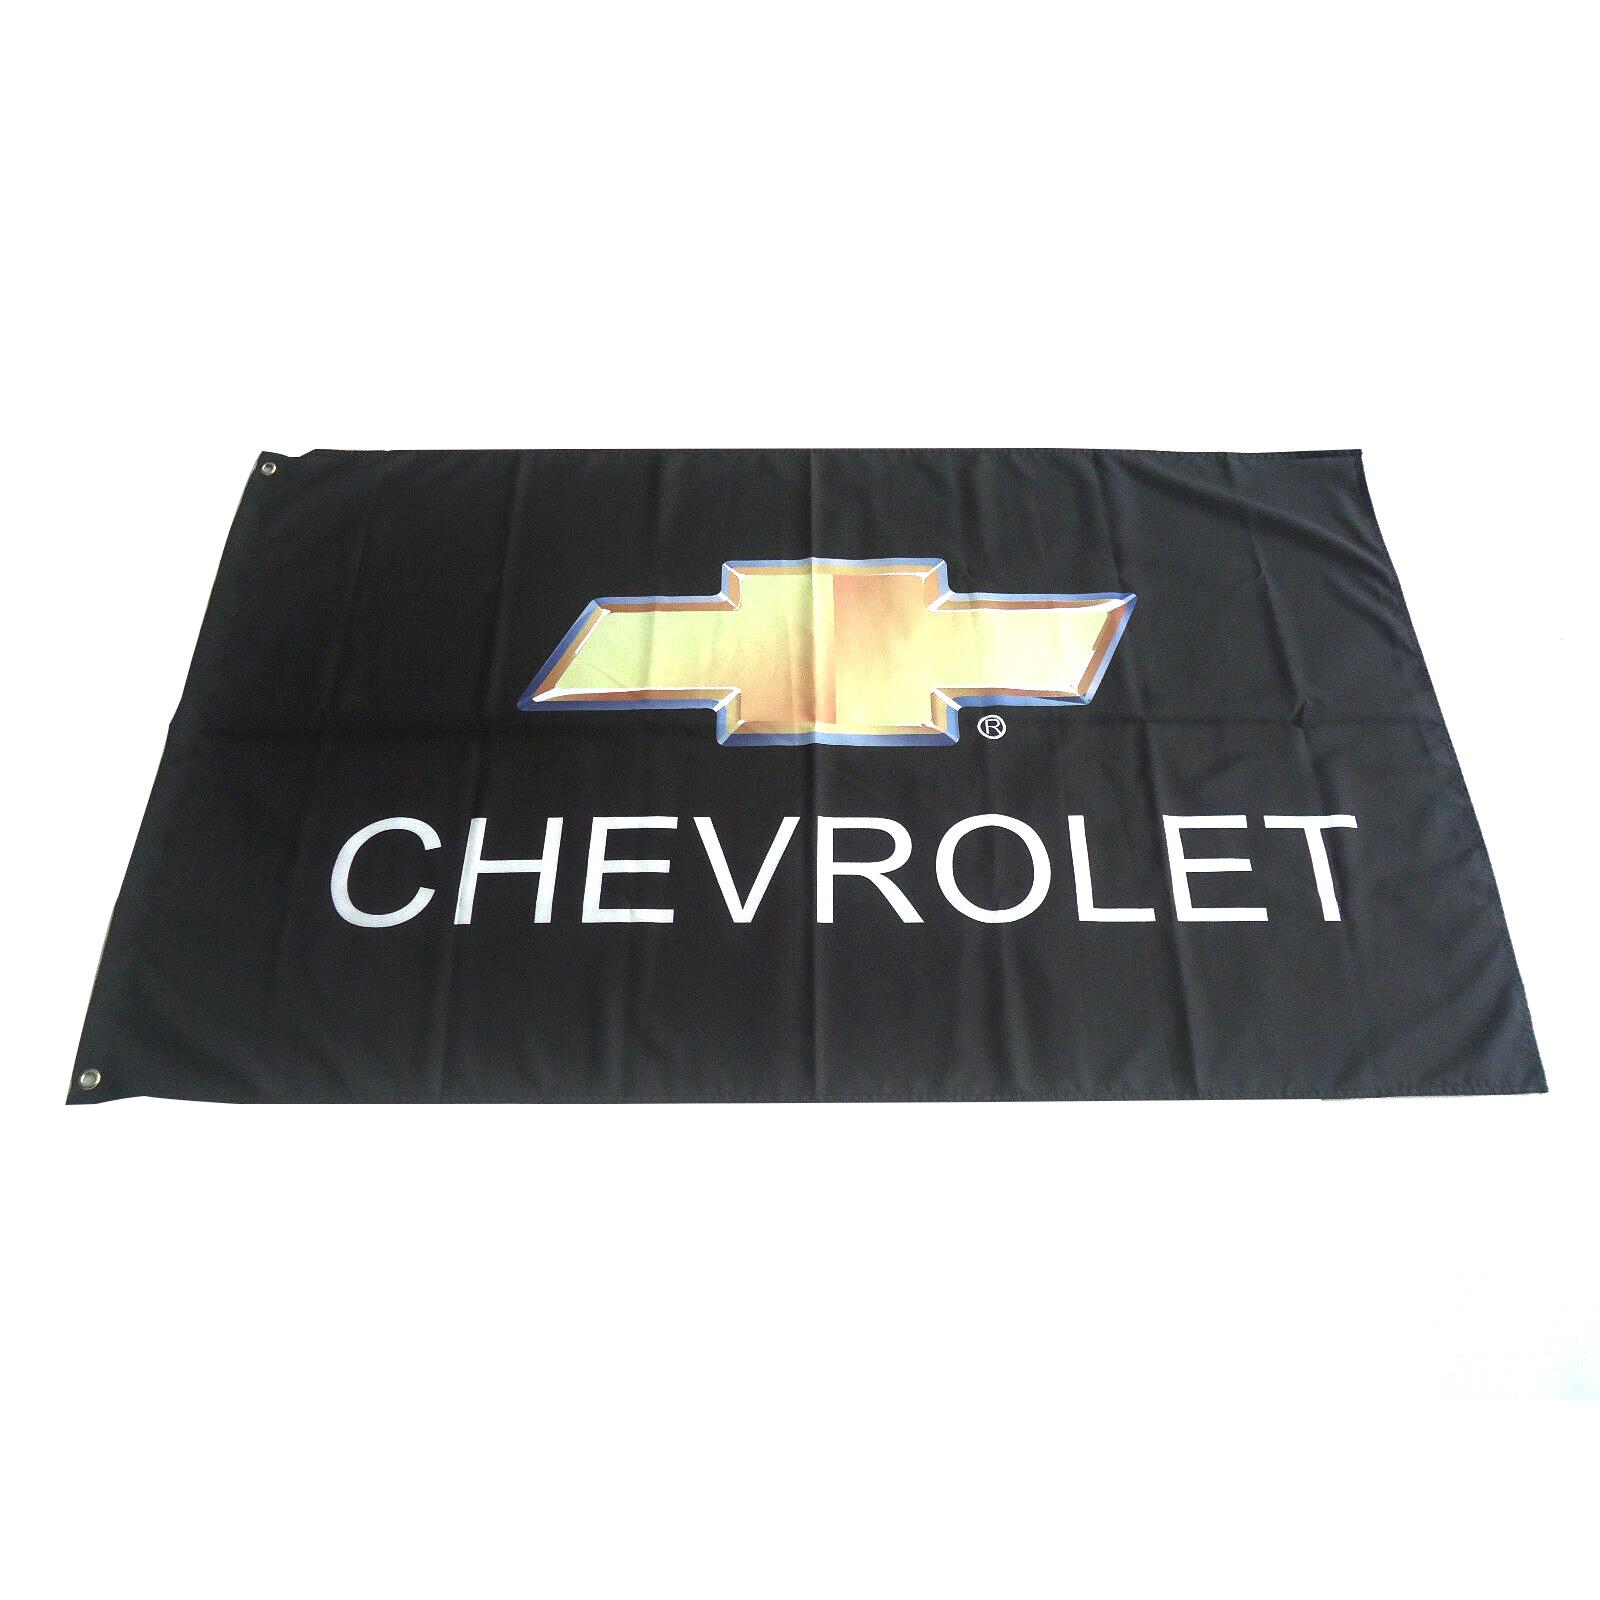 Banner Flag for Corvette Racing Flag 3x5 FT Black Wall Banner Shop Show Decor